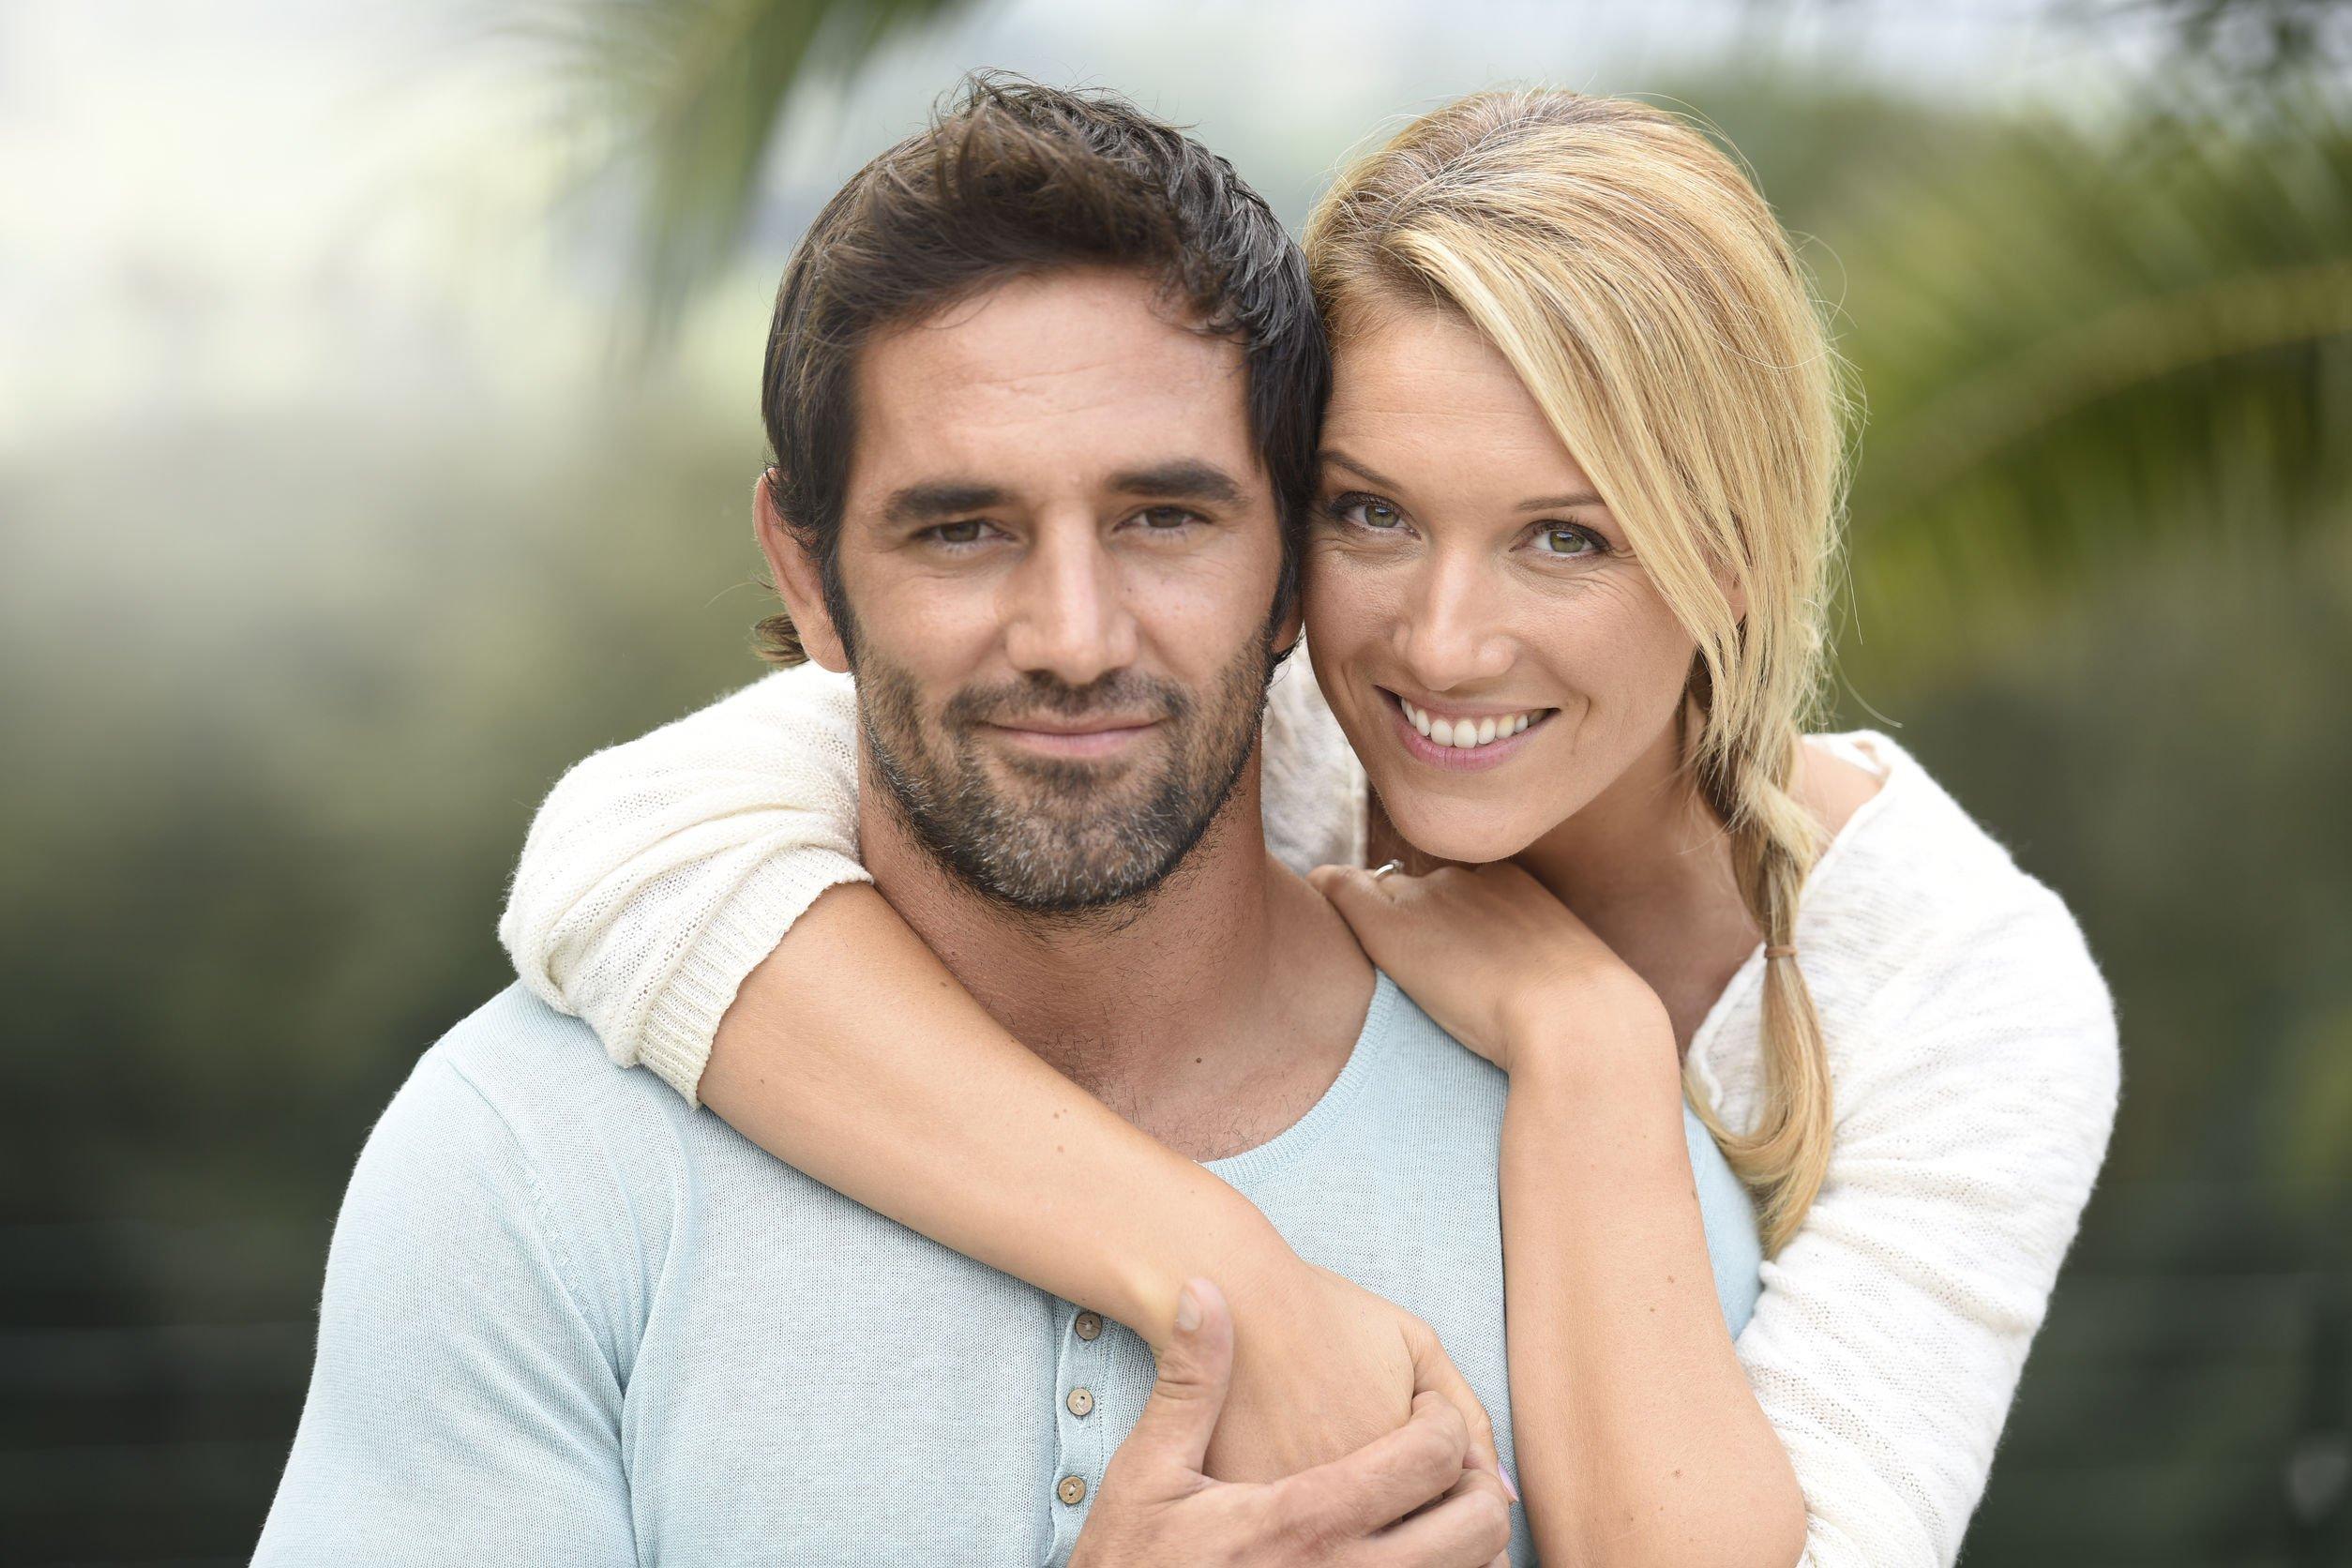 datingreddit a vztahy